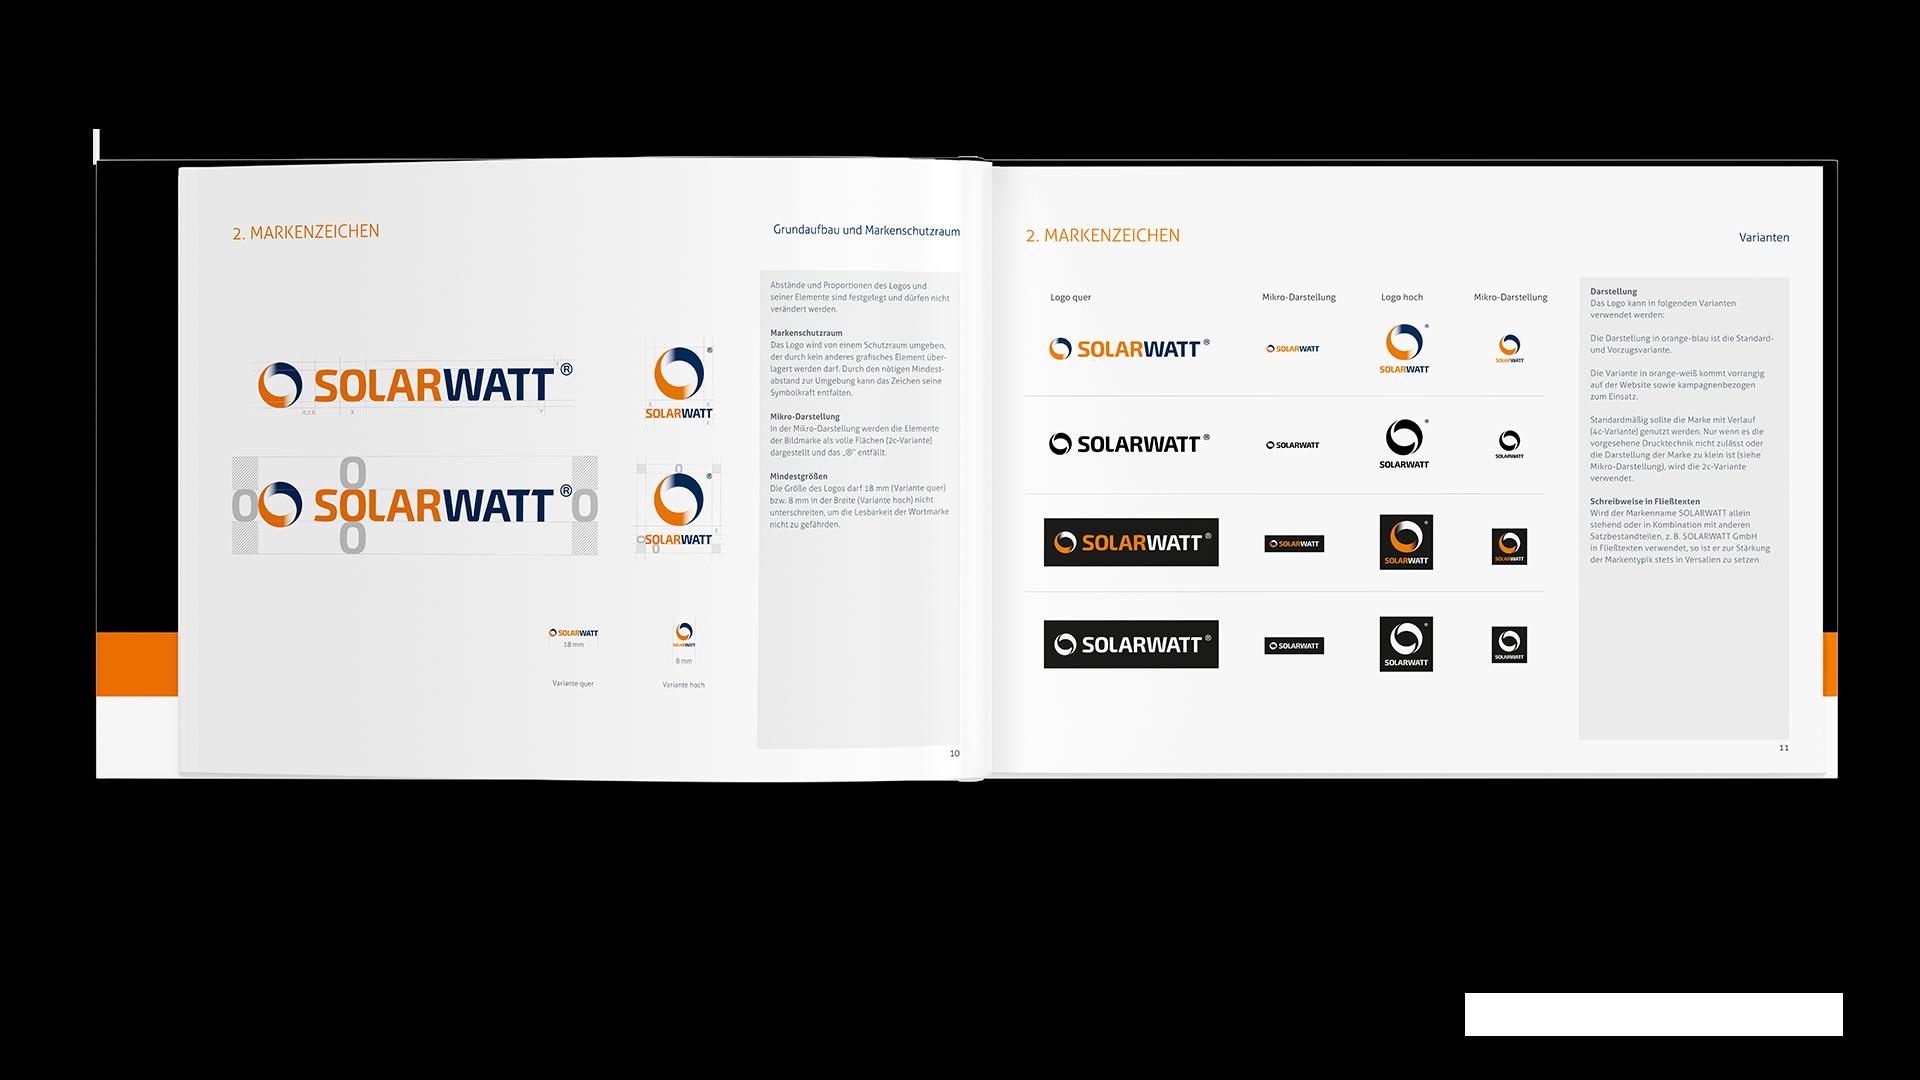 solarwatt_content_handbuch2